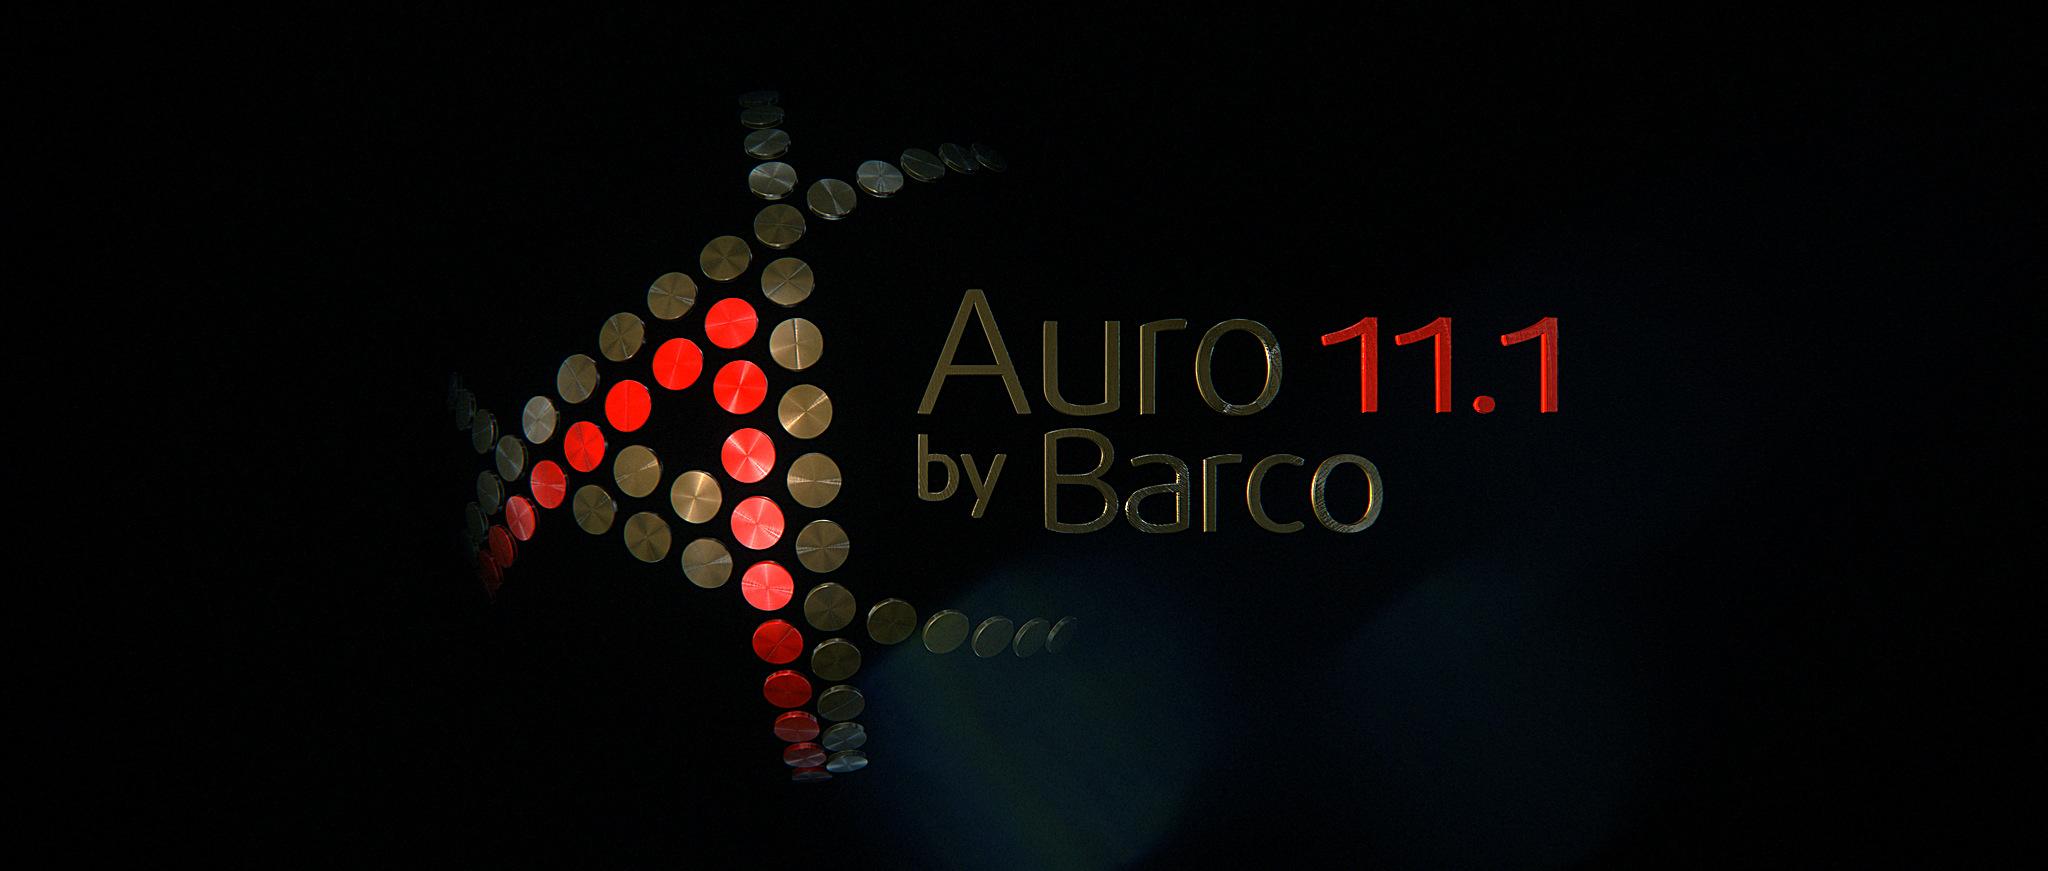 Auro 3d Intro Mindmedicine